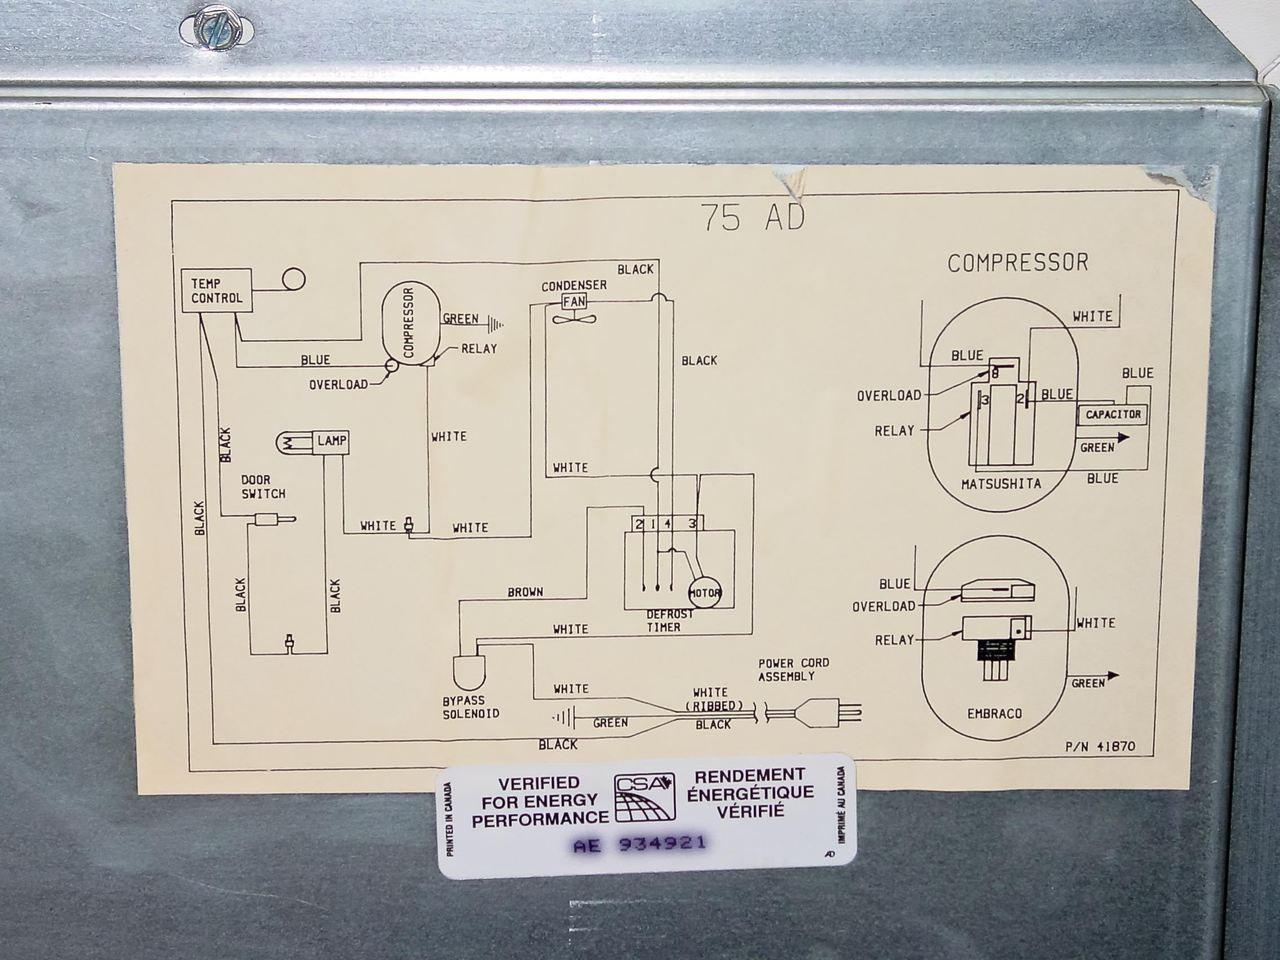 polarstar undercounter lab refrigerator jewett refrigerator co polarstar undercounter lab refrigerator [ 1280 x 960 Pixel ]